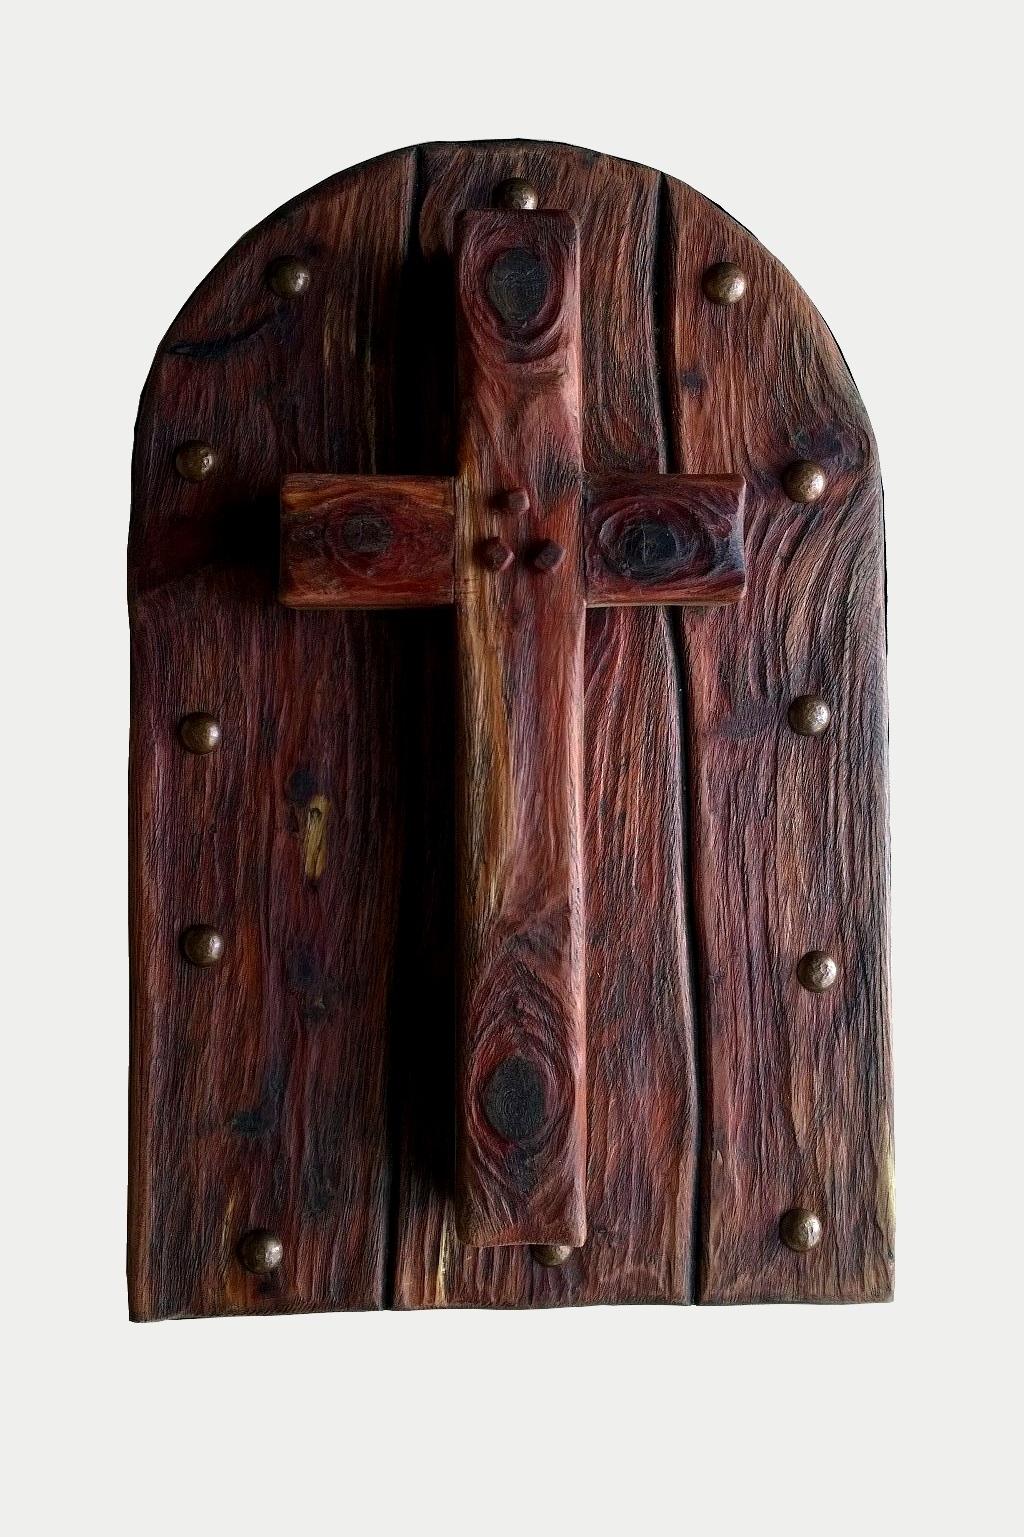 Cedar wall cross